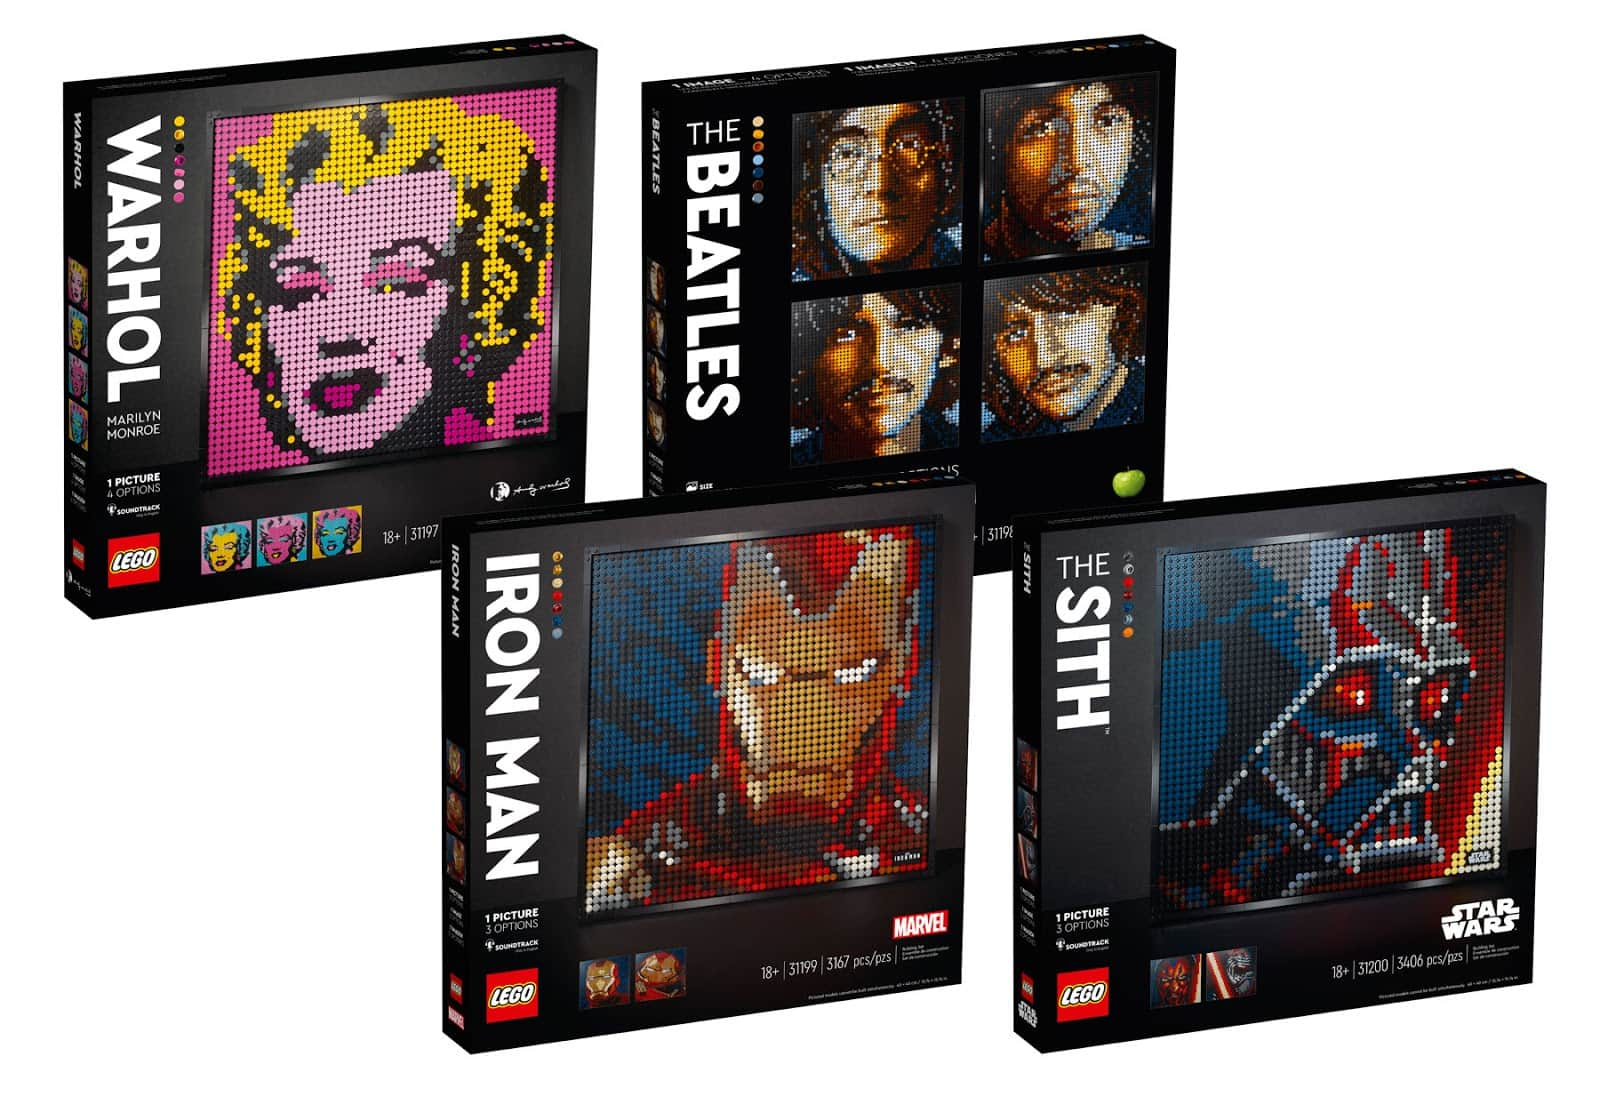 LEGO Art Building Kits: Andy Warhol's Marilyn Monroe, The Beatles or Iron Man